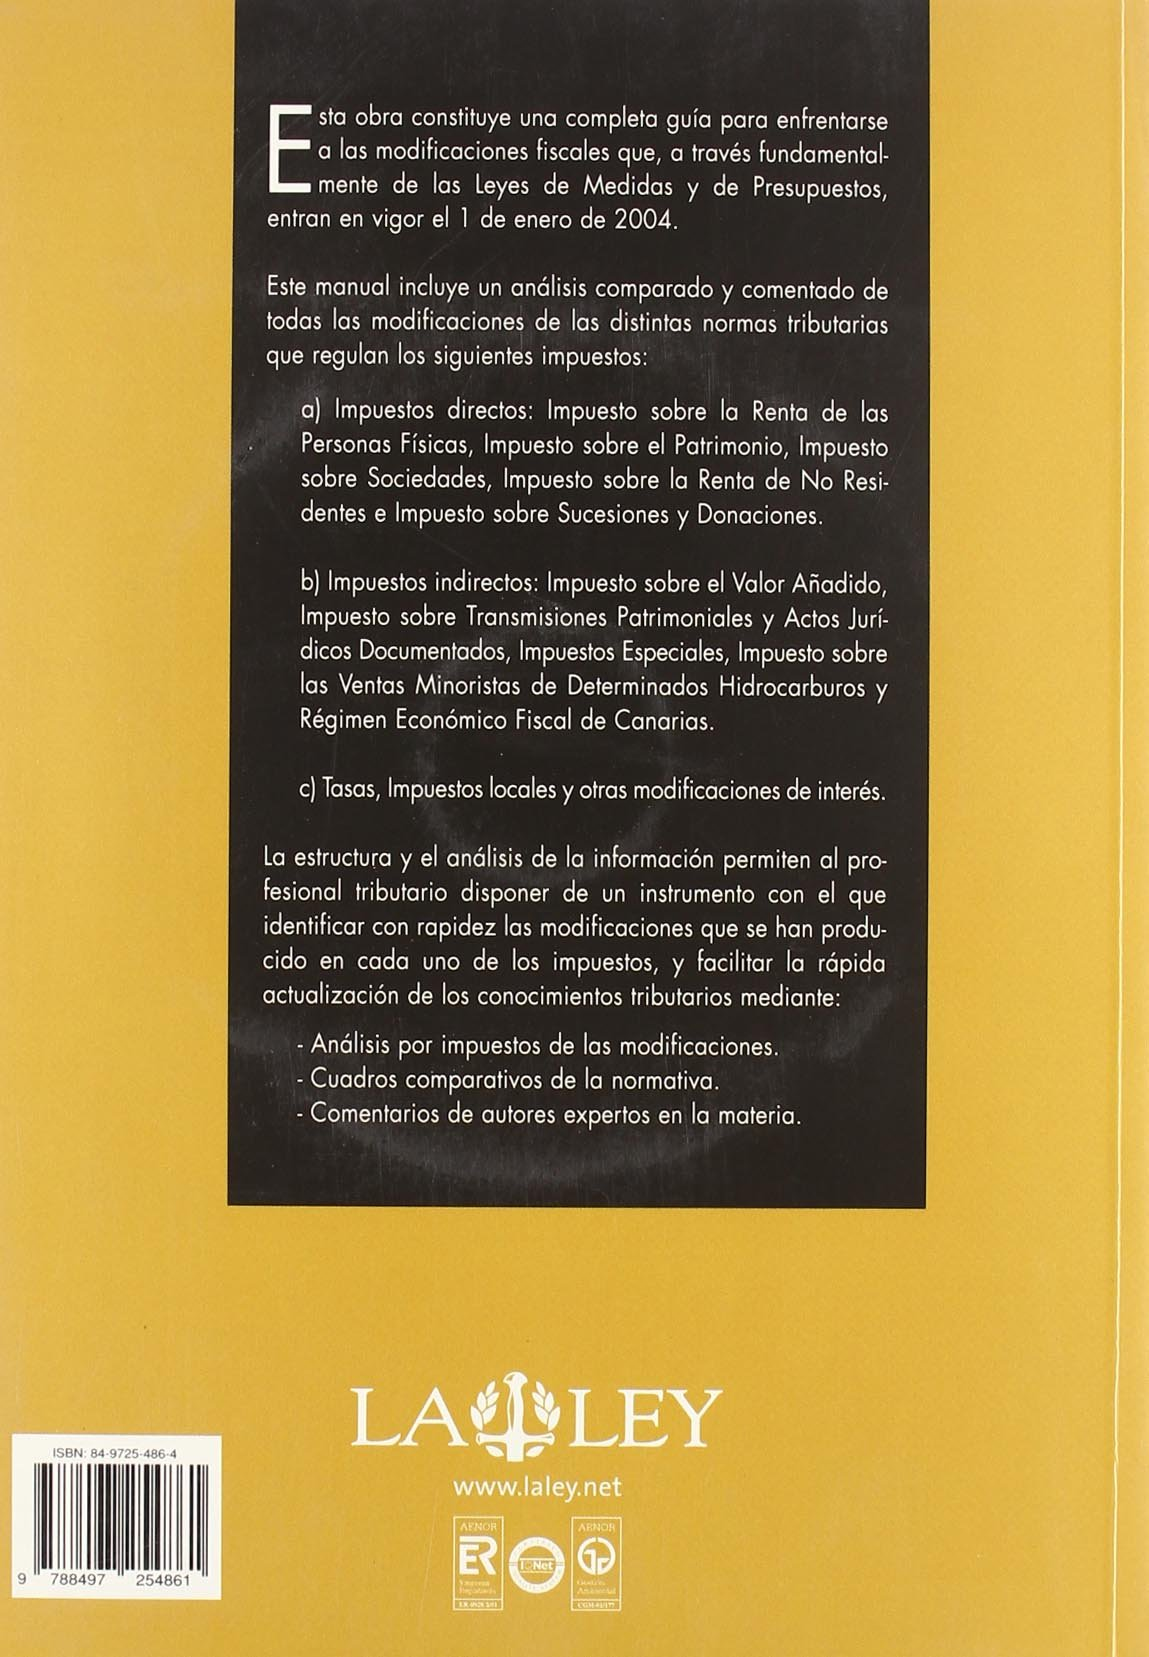 NOVEDADES FISCALES 2004.(INCLUYE CD-R).: 9788497254861: Amazon.com: Books